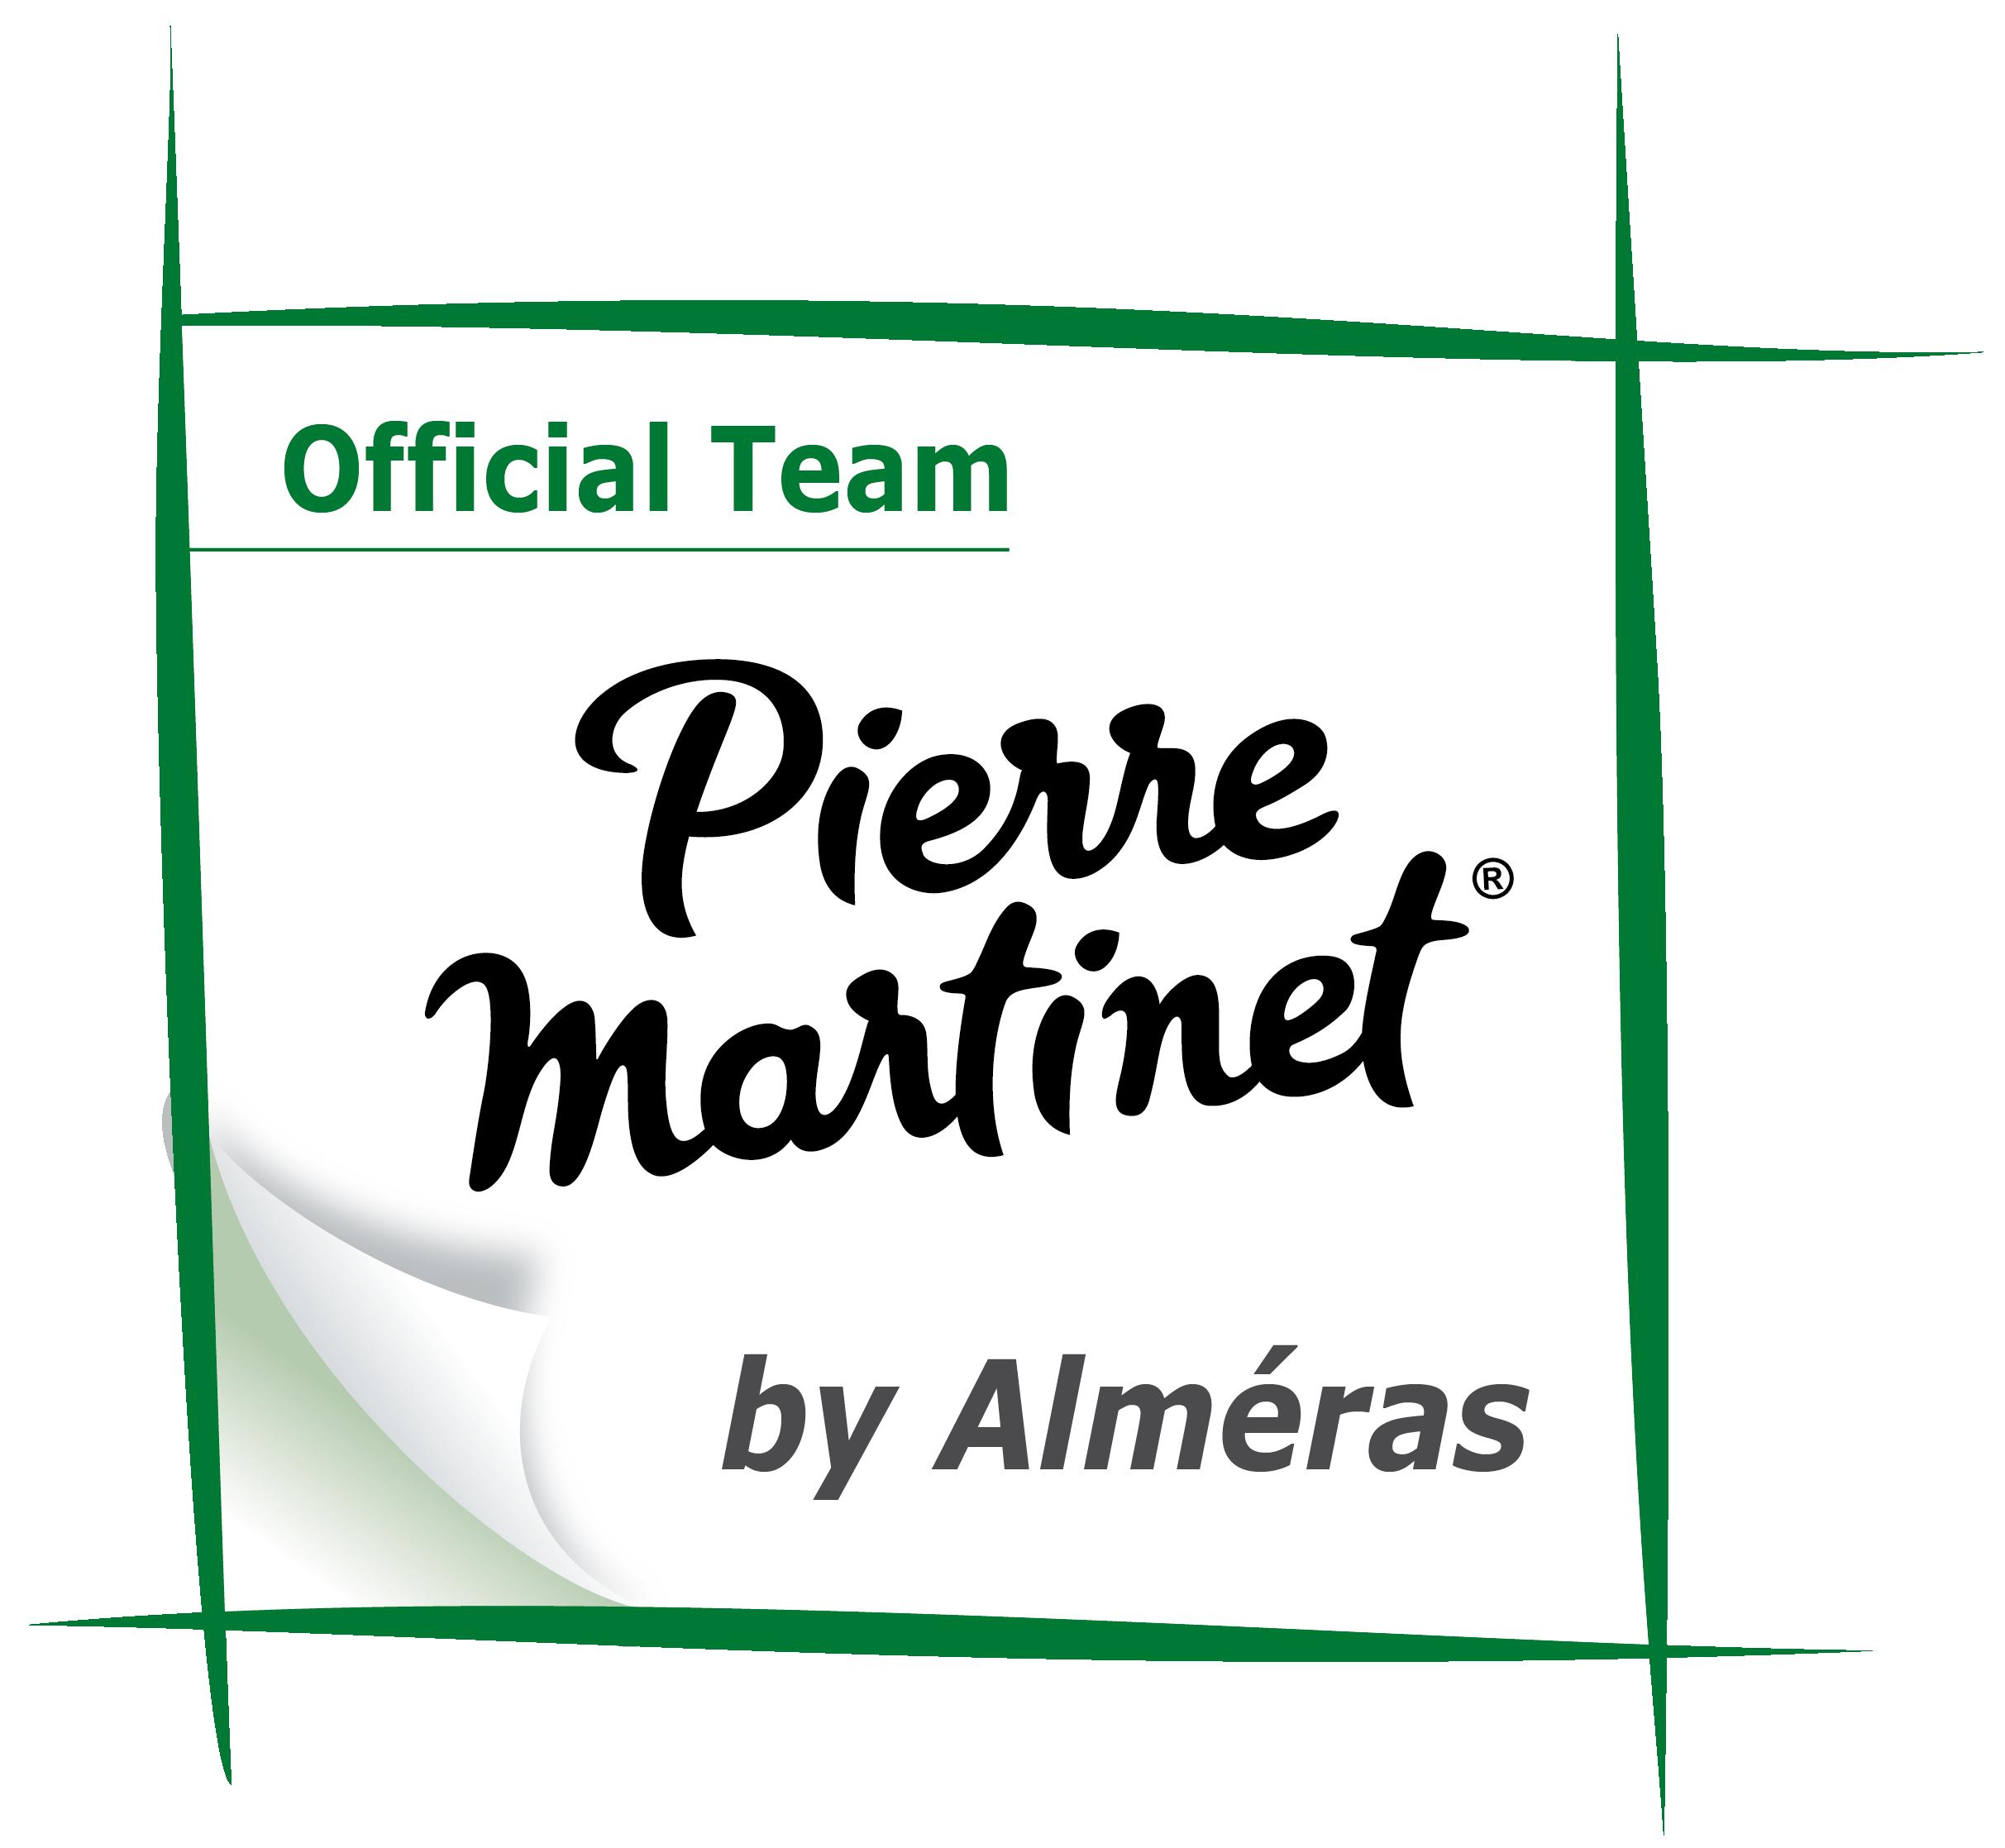 Logo_Martinet-by-Almeras-300